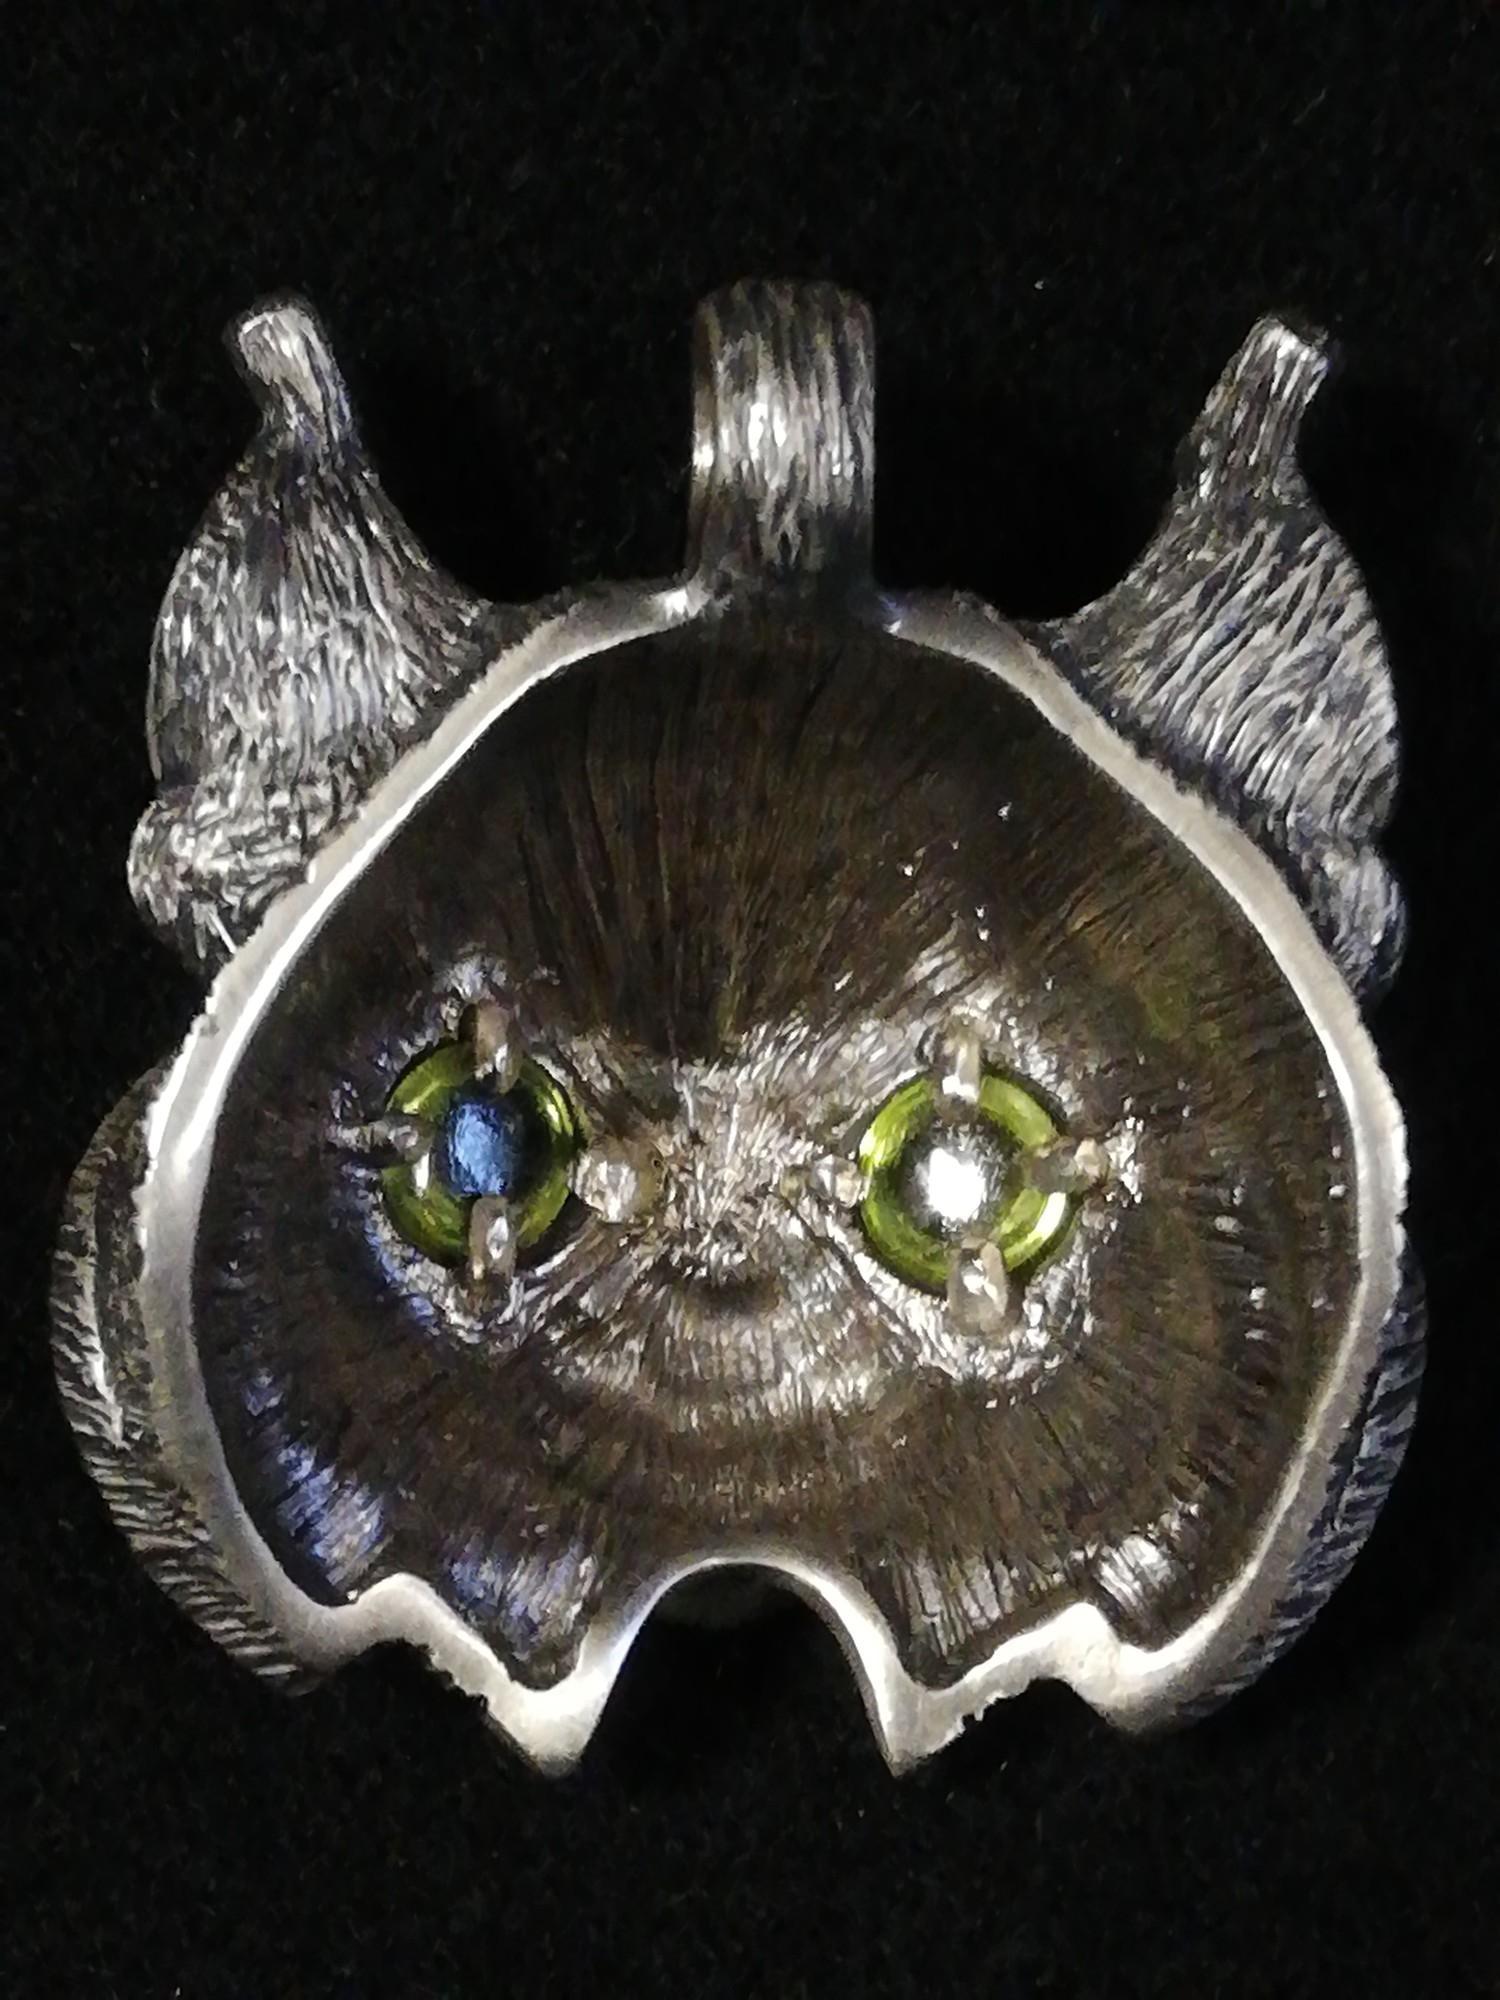 Argent Aqua Jewellery by Adrian Ashley unusual silver lynx pendant set with peridot eyes - Image 2 of 2